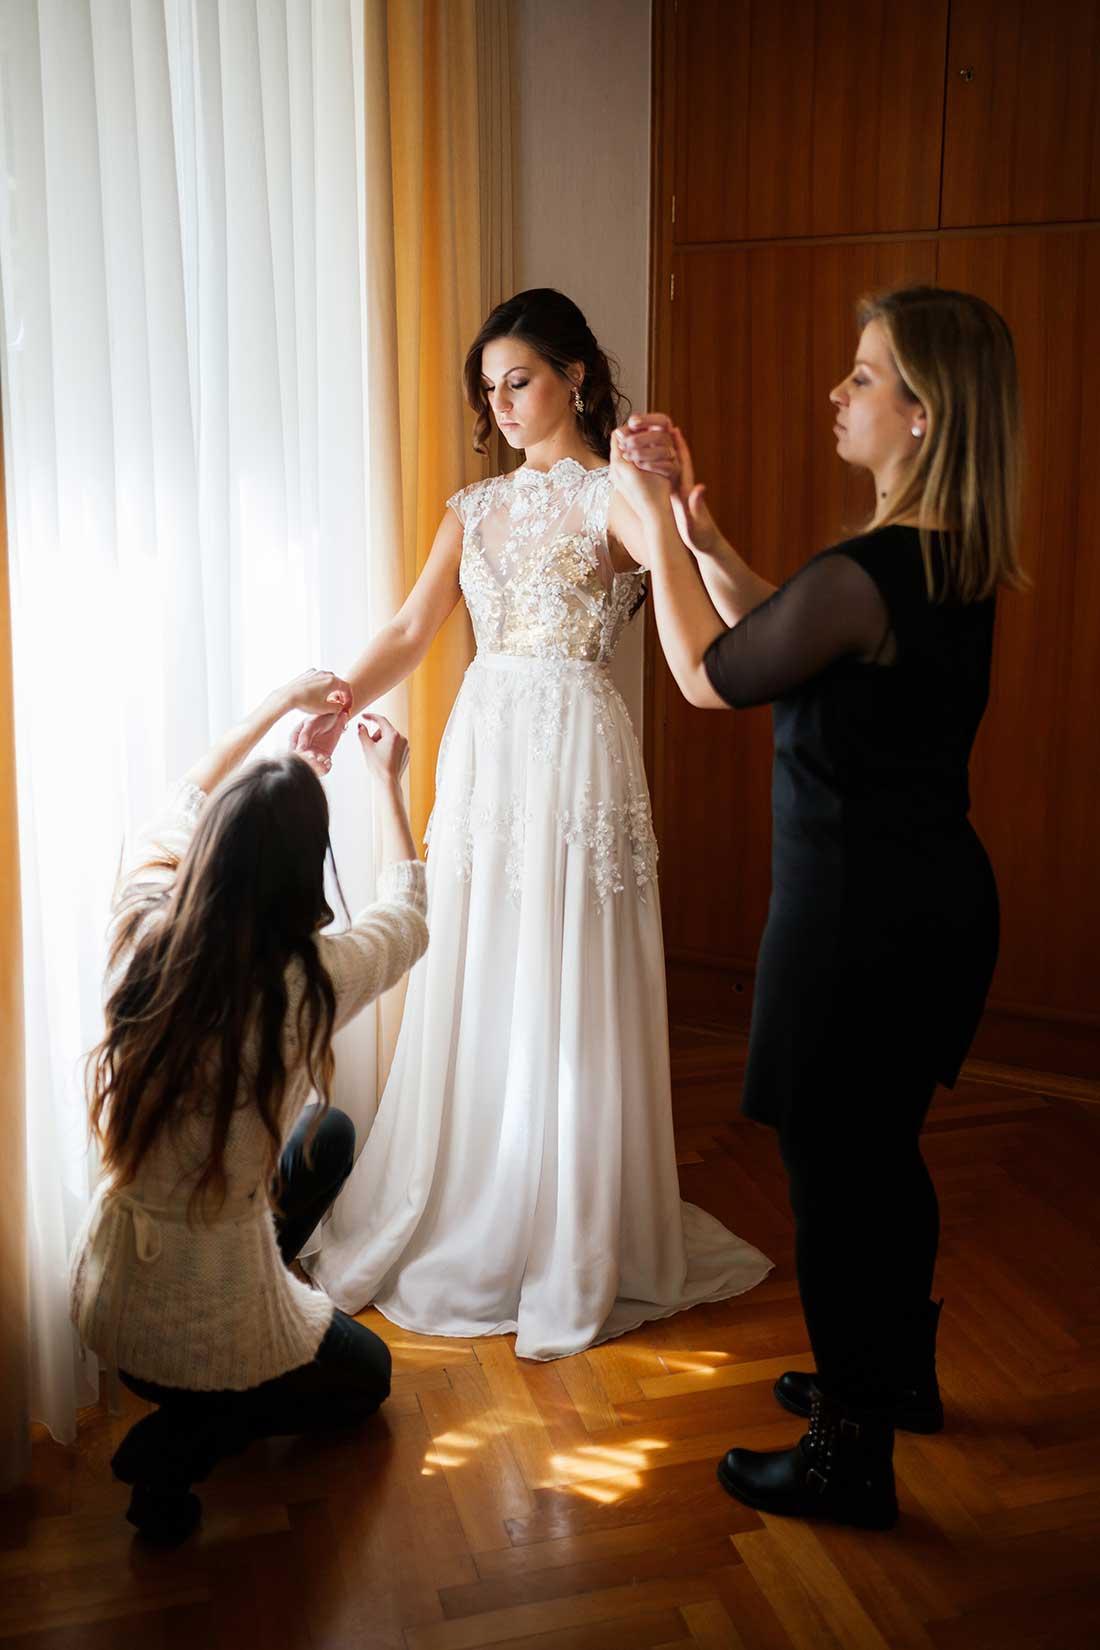 MA-08-final-touches-bride